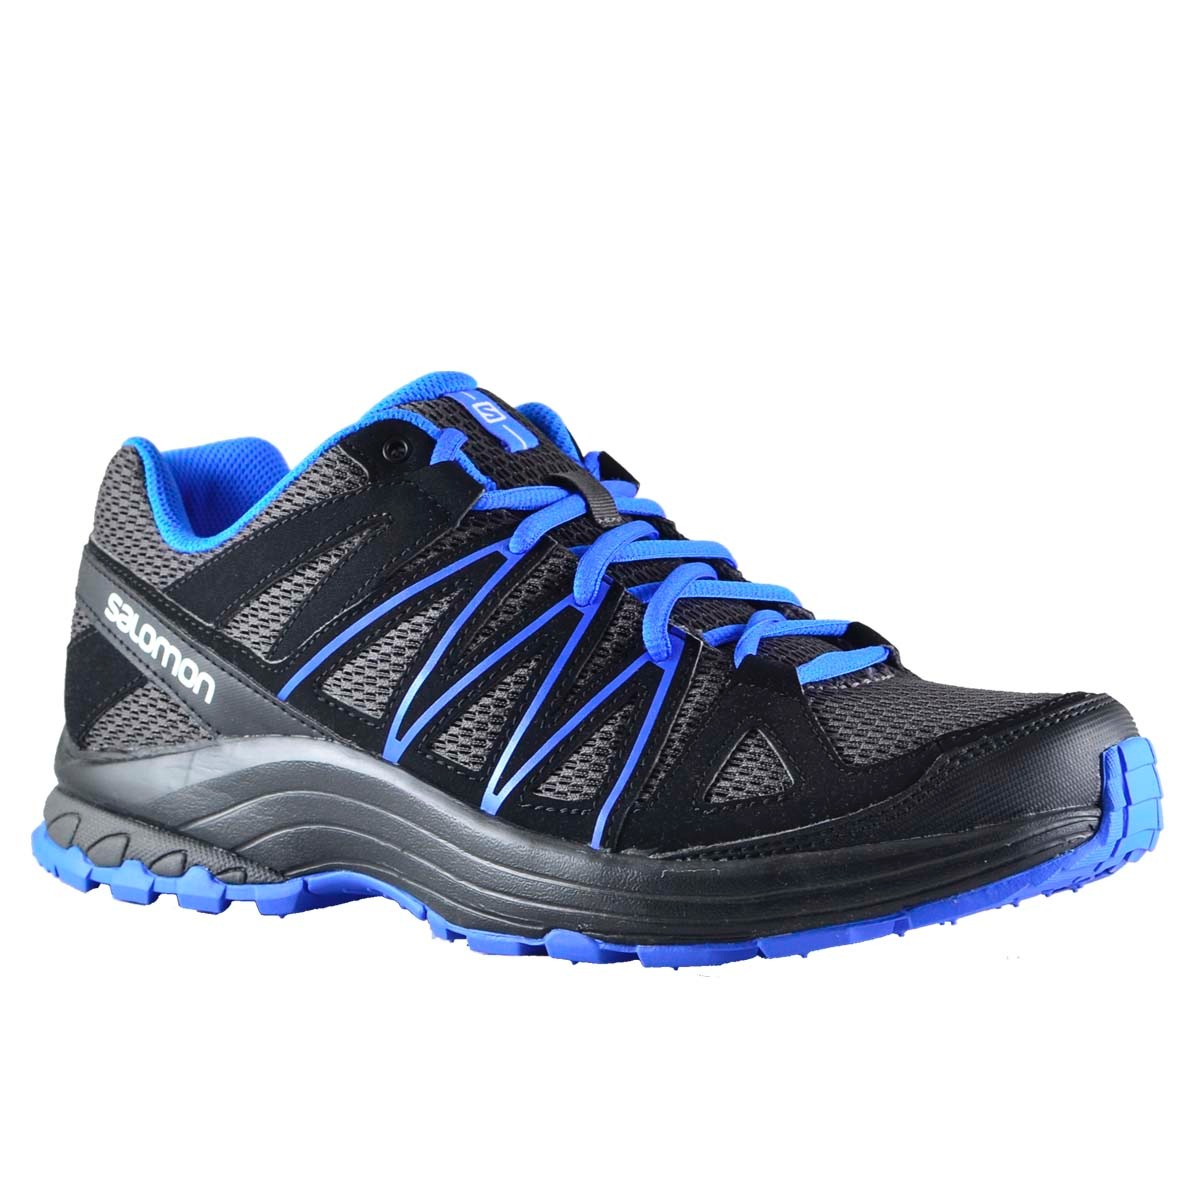 salomon bondcliff mens trail running shoes review miami